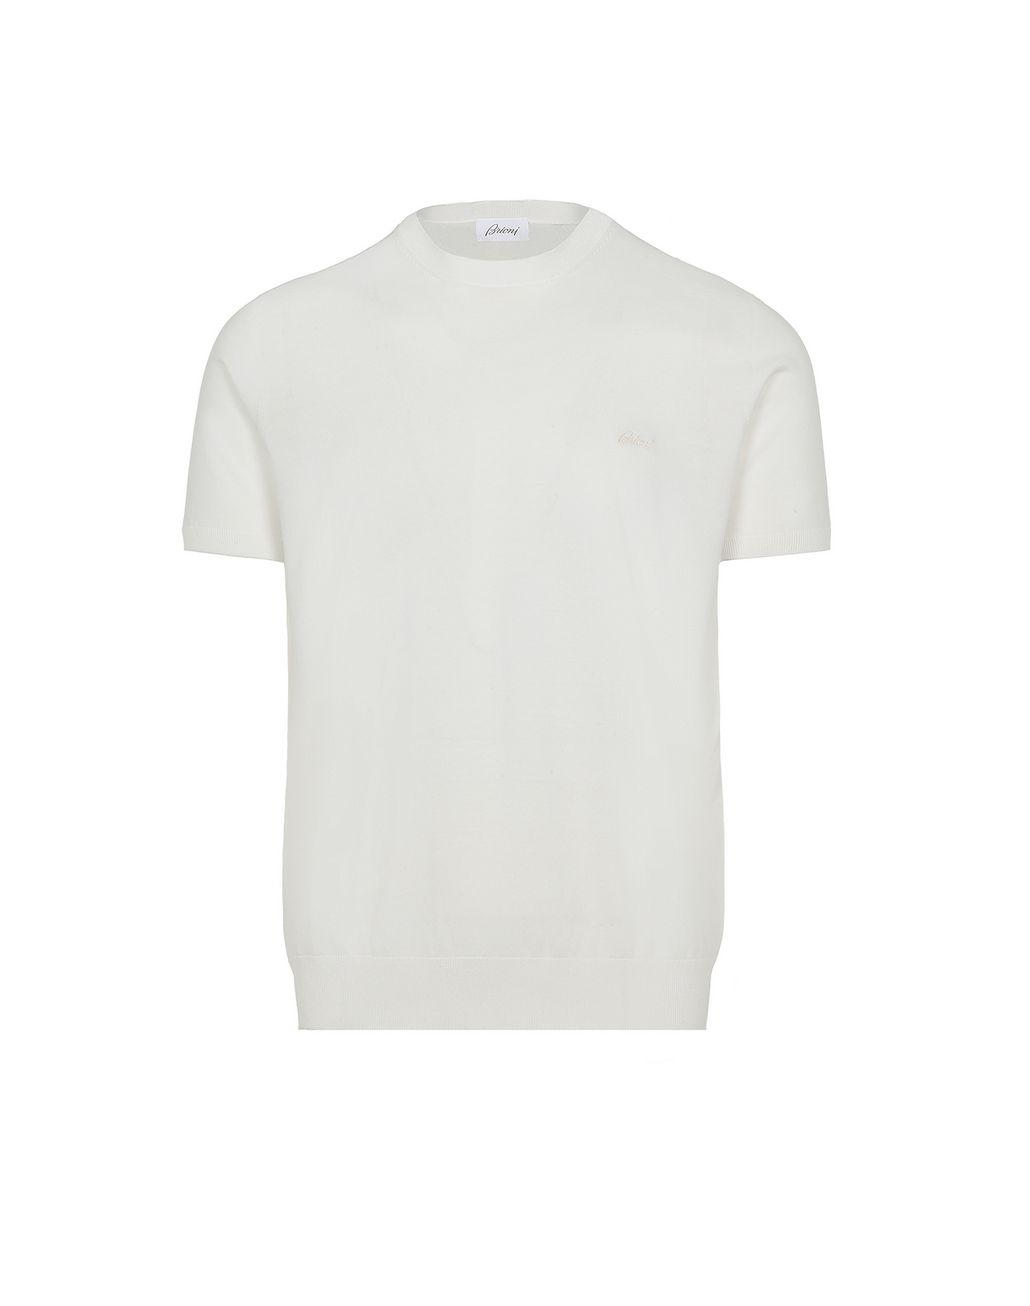 BRIONI White Logoed T-Shirt T-Shirts & Polos Man f